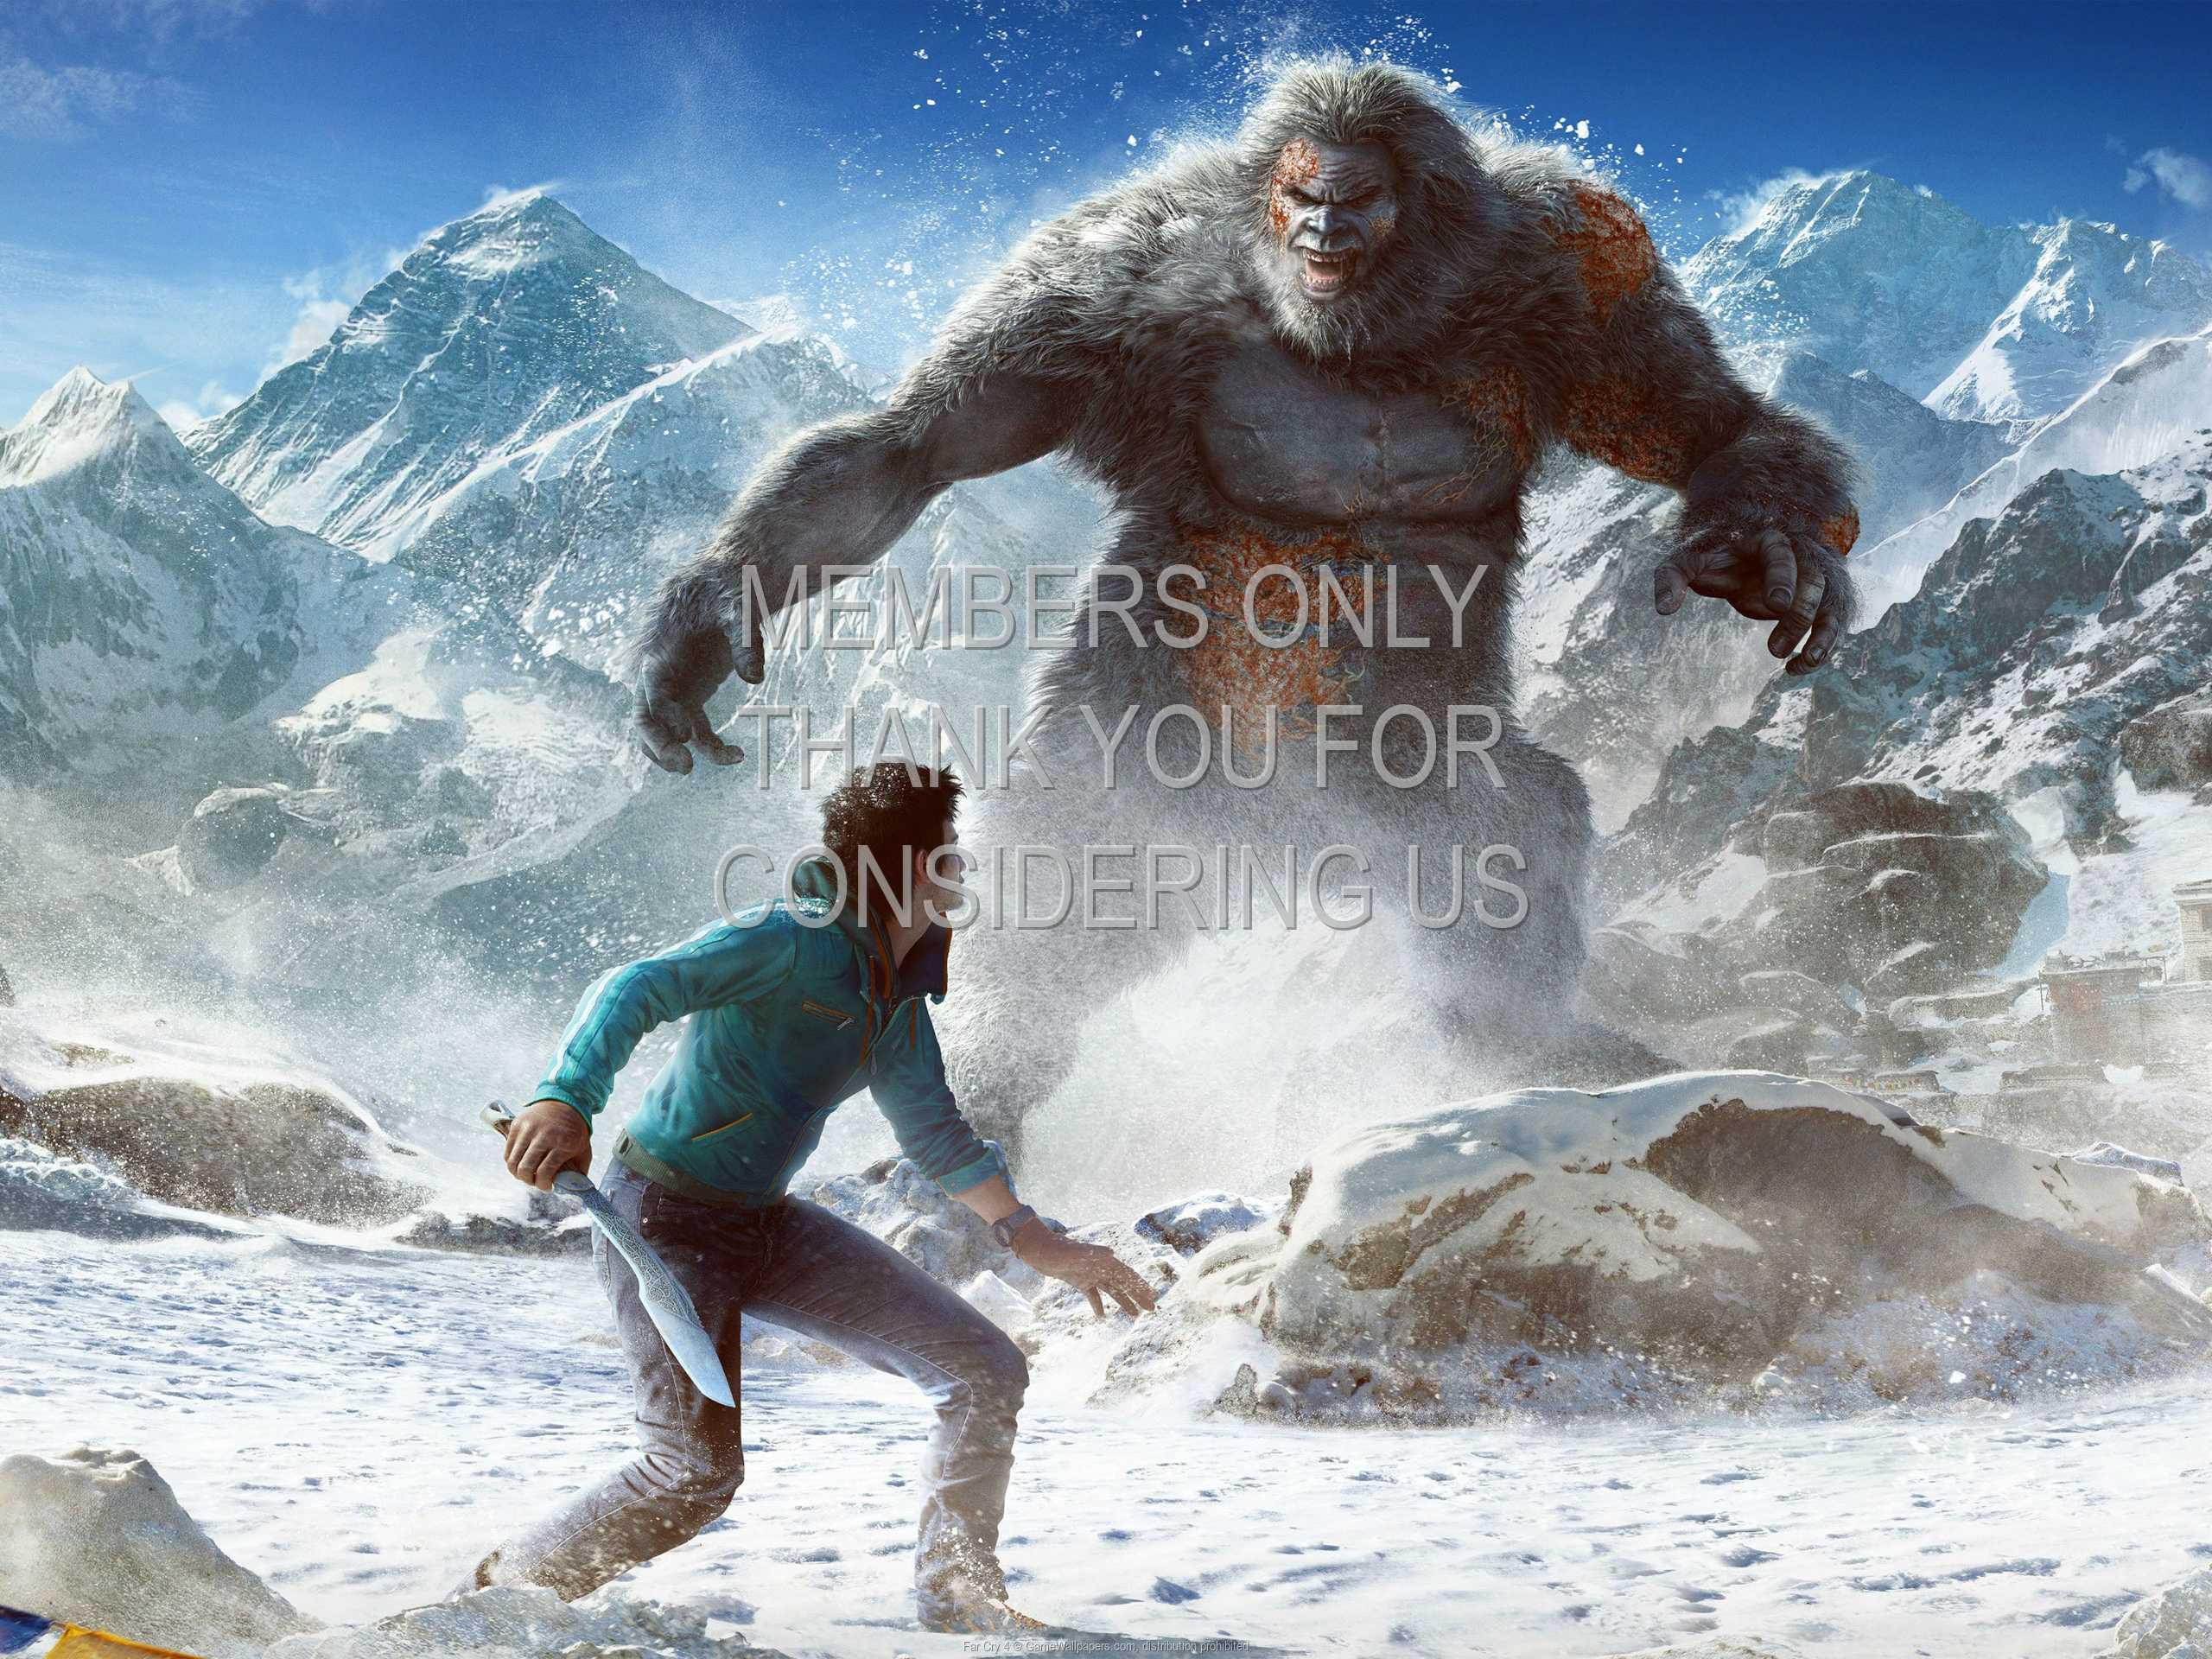 Far Cry 4 Wallpaper 08 1080p Horizontal